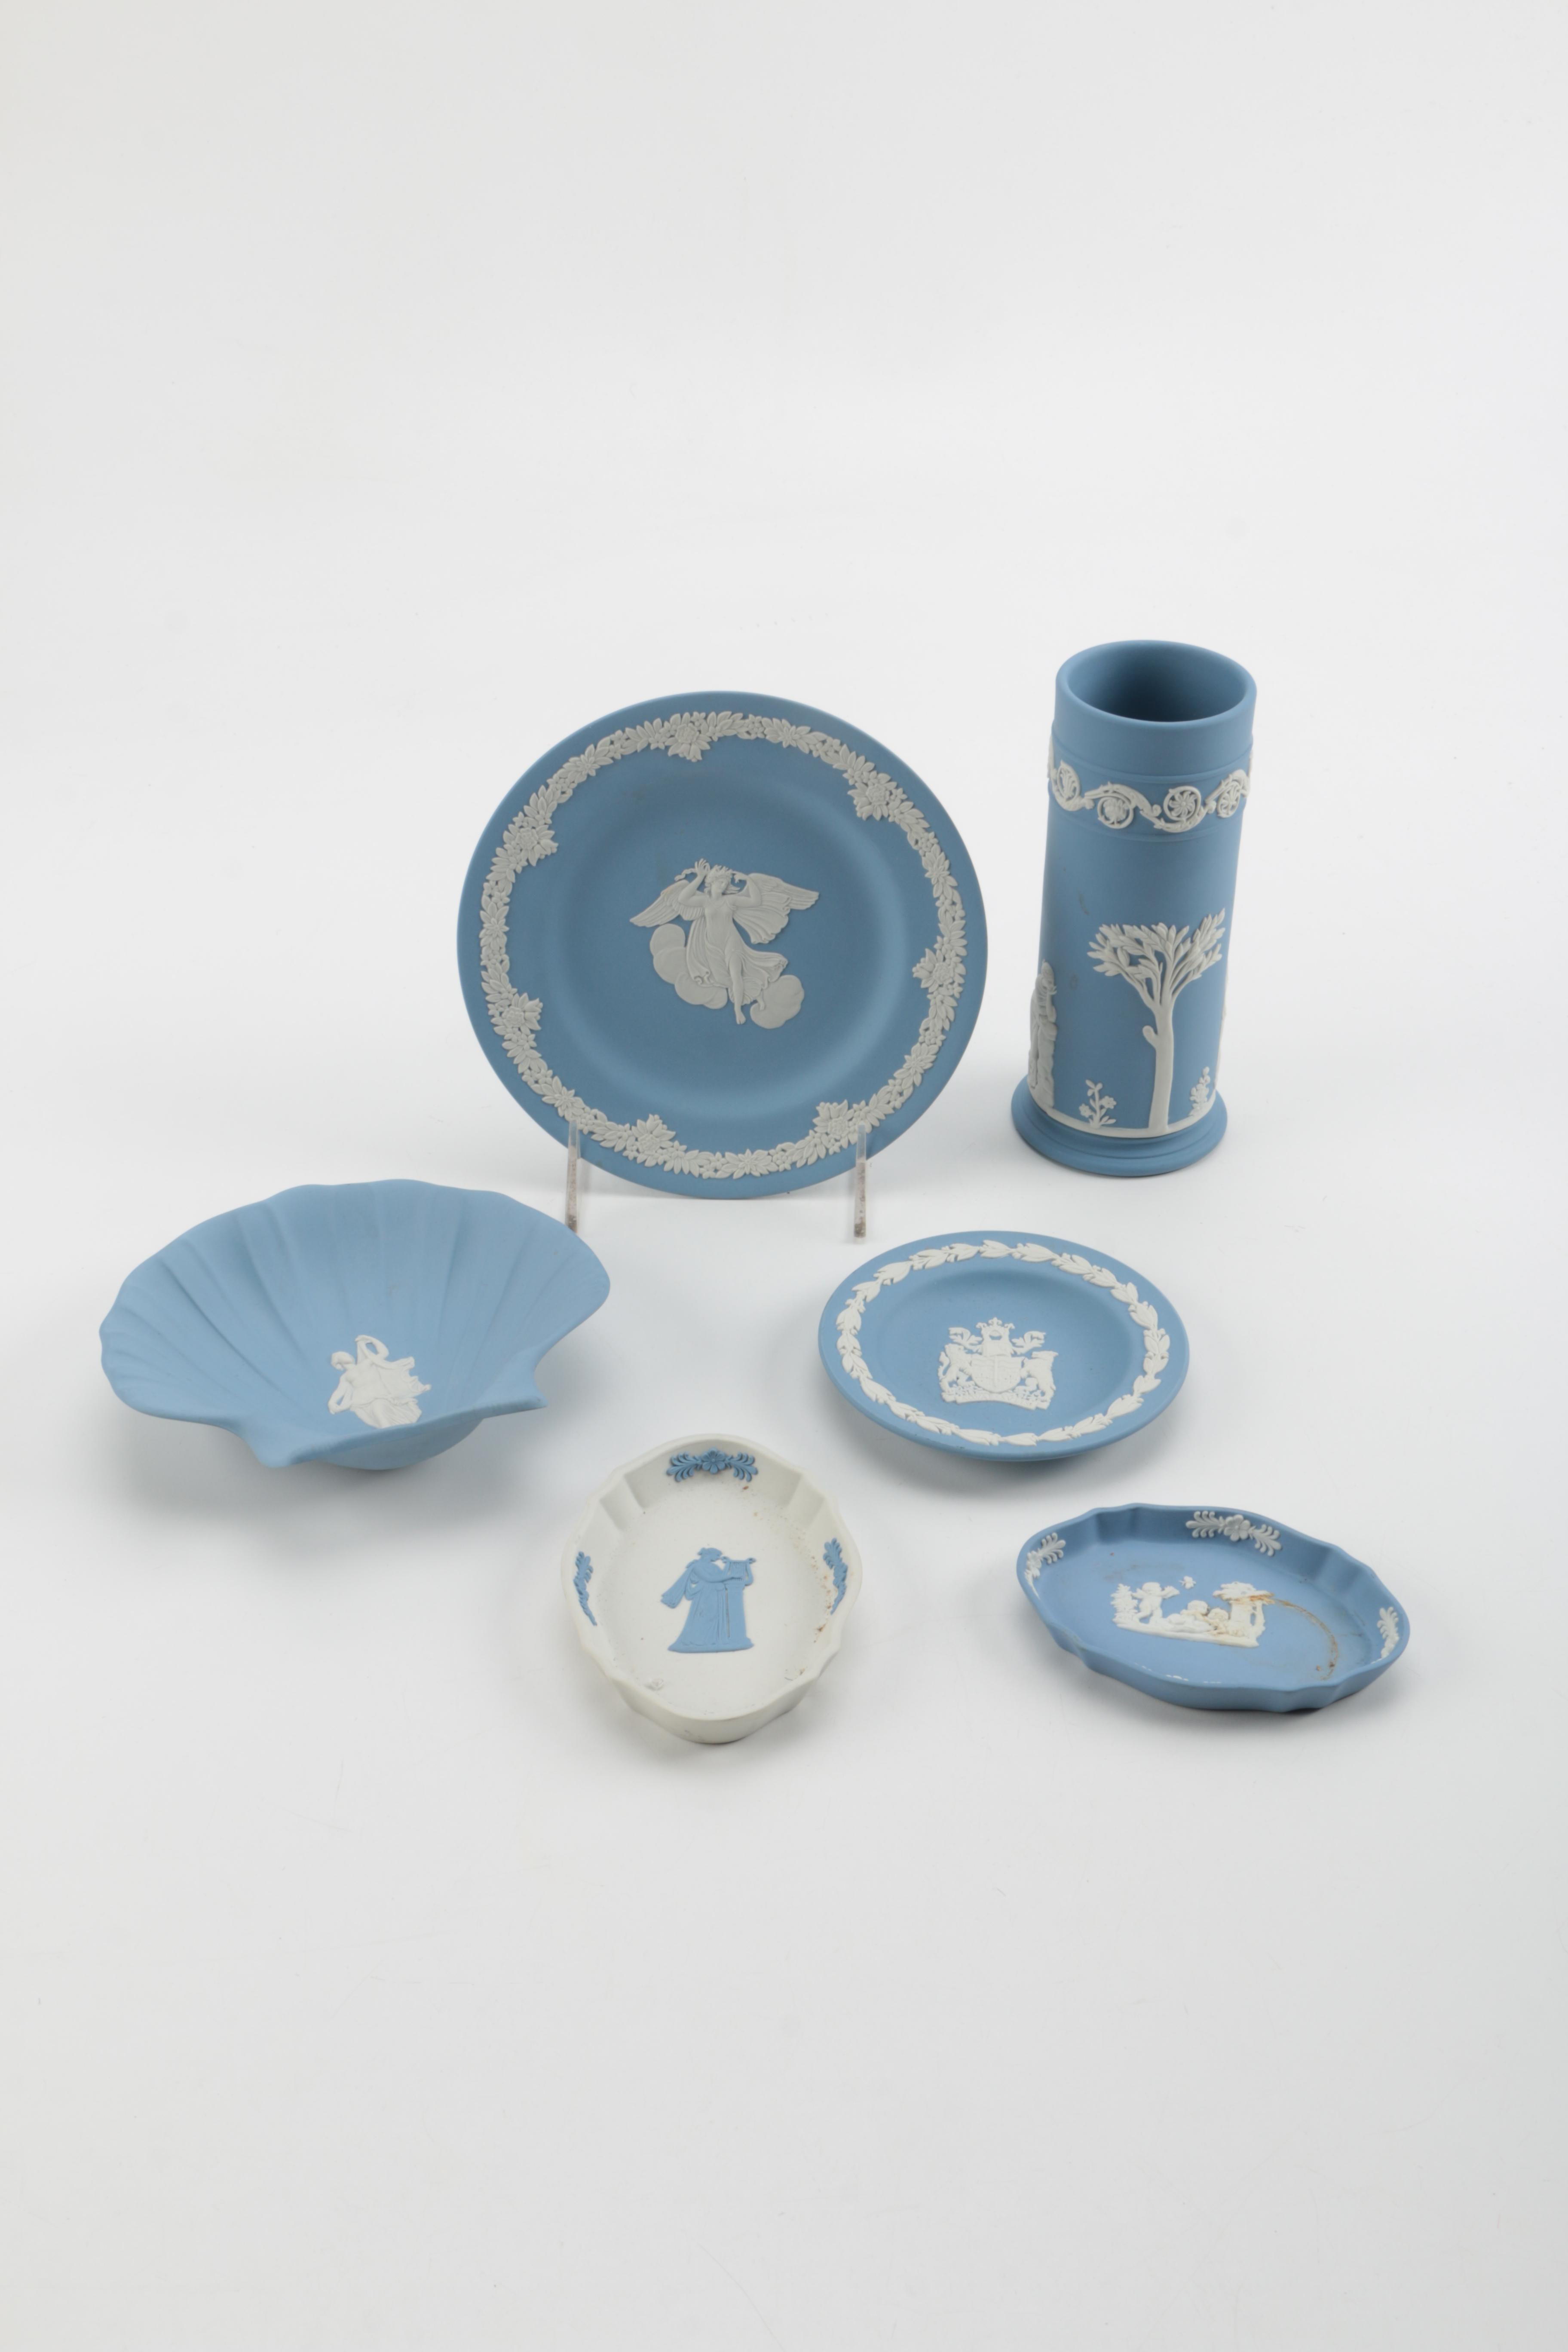 Wedgwood Blue Jasper Spill Vase and Others